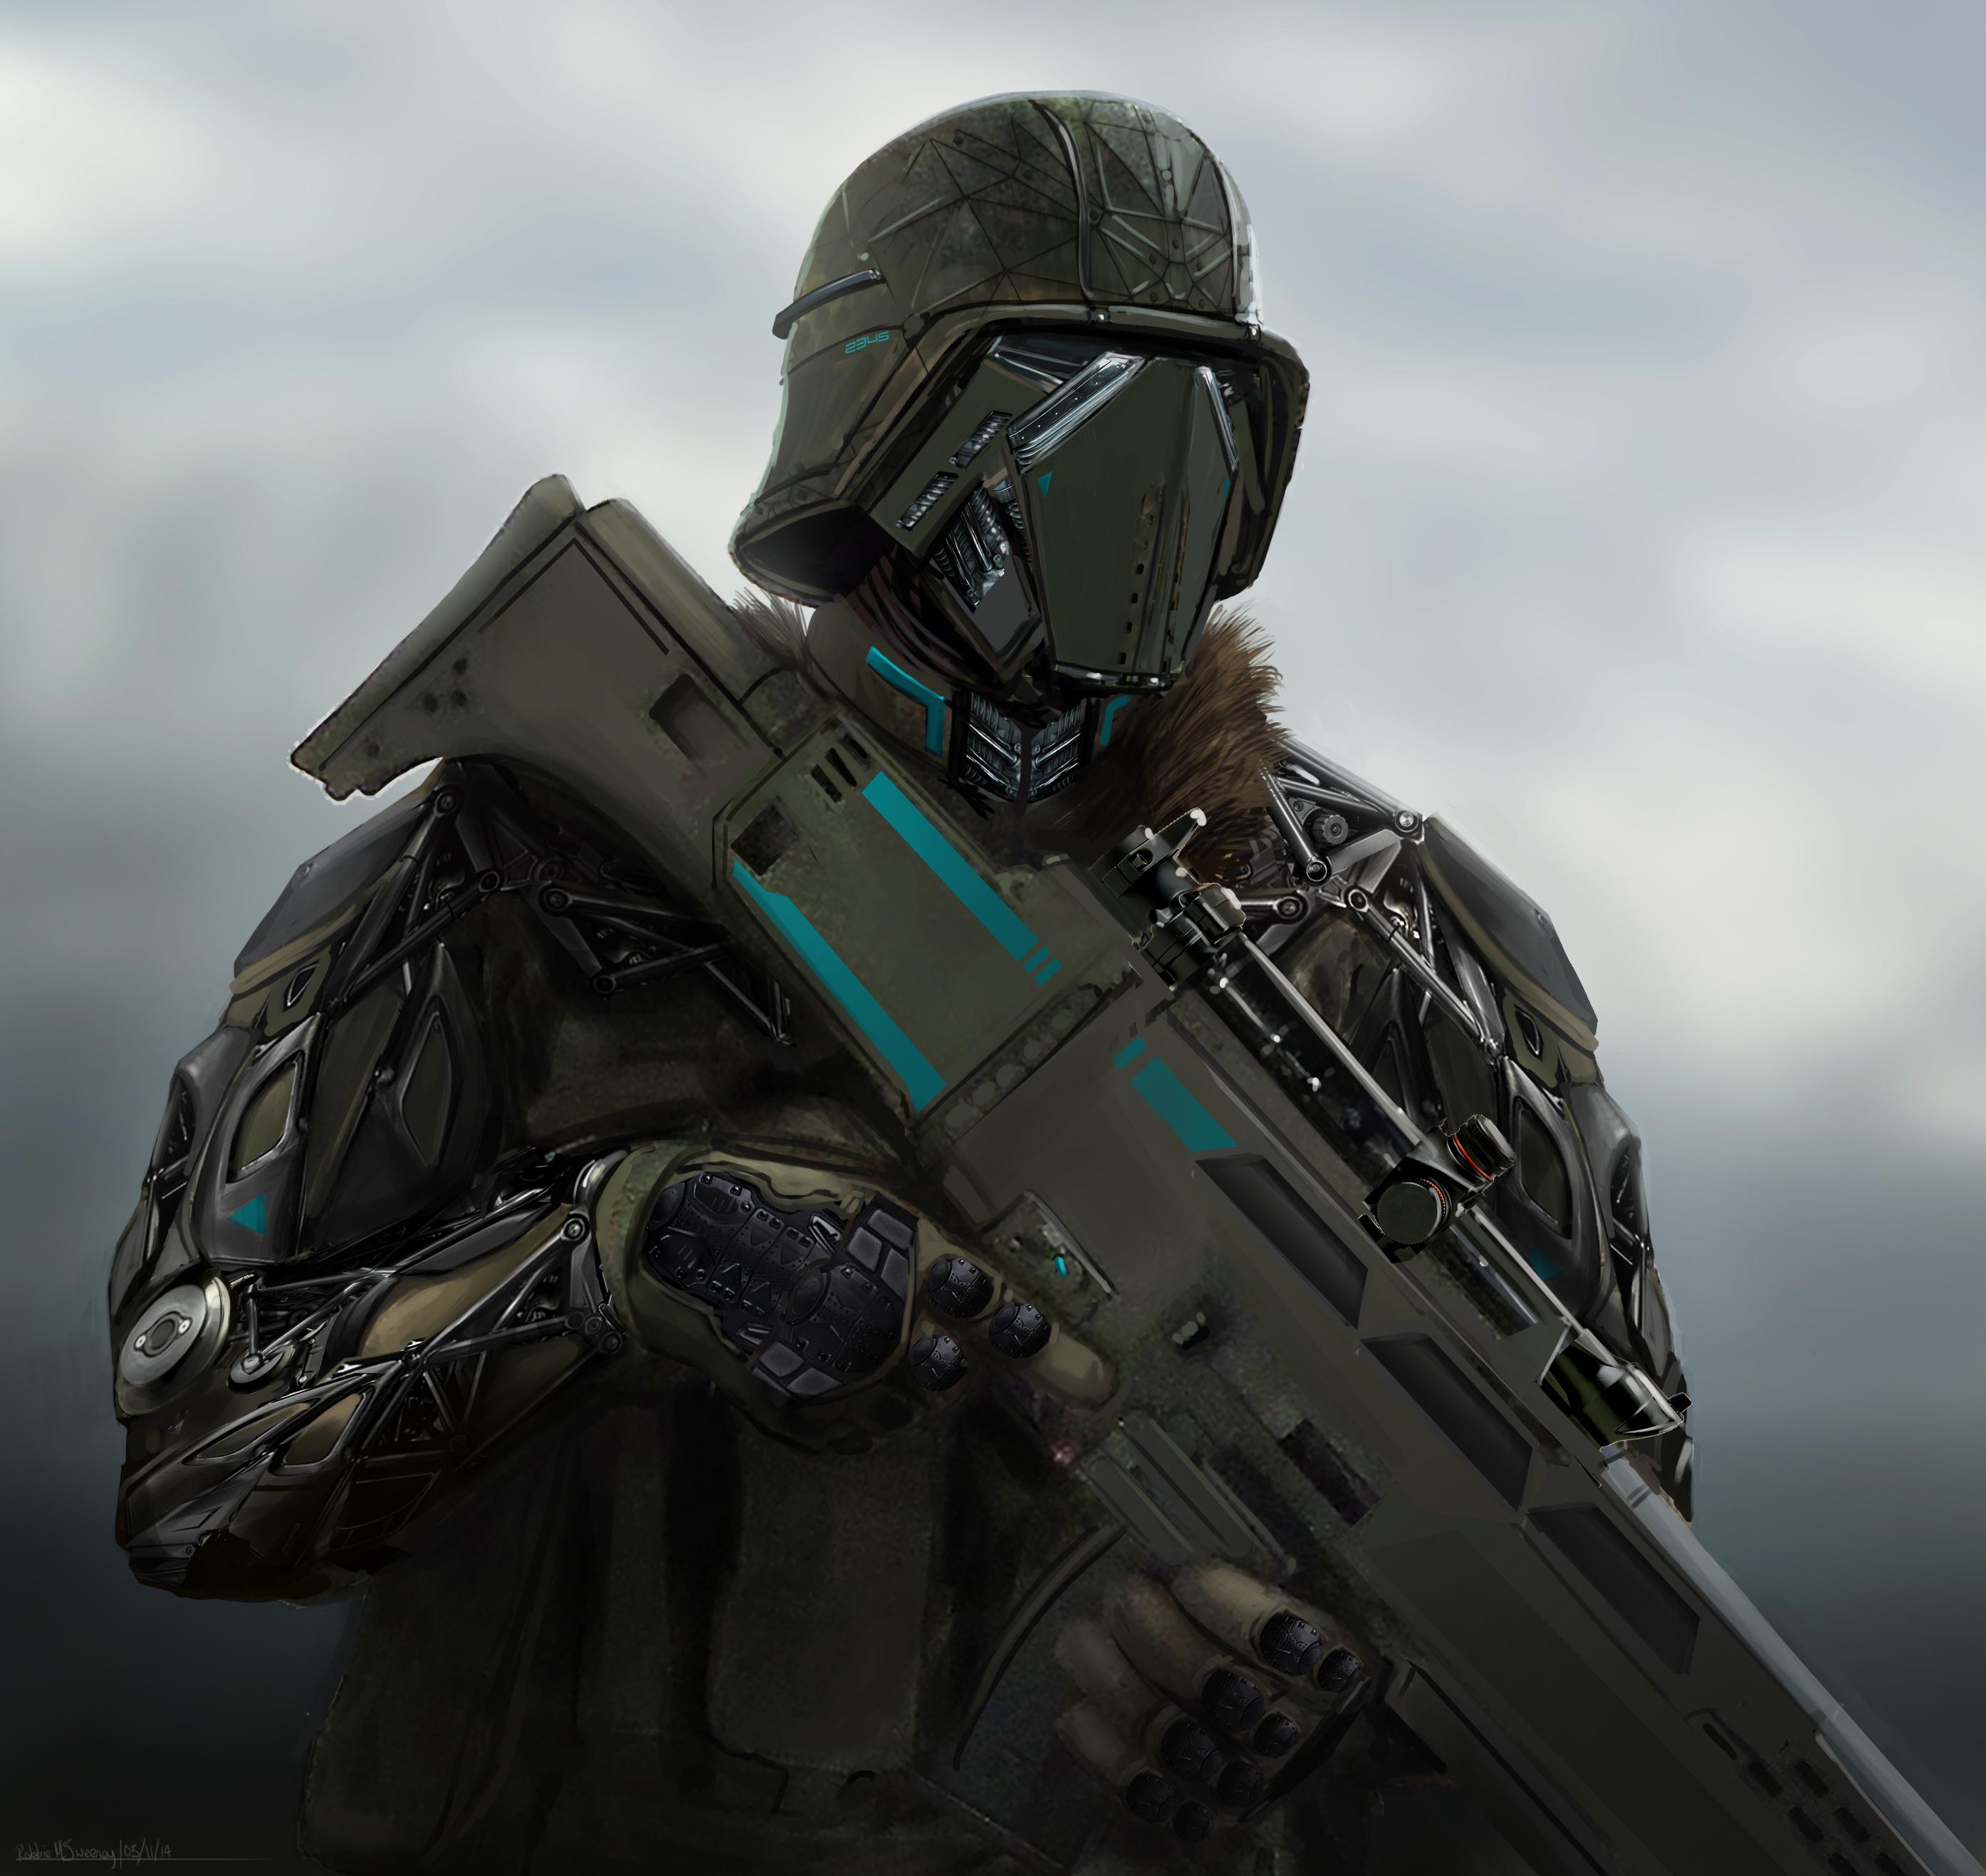 Futuristic sci-fi soldier dude